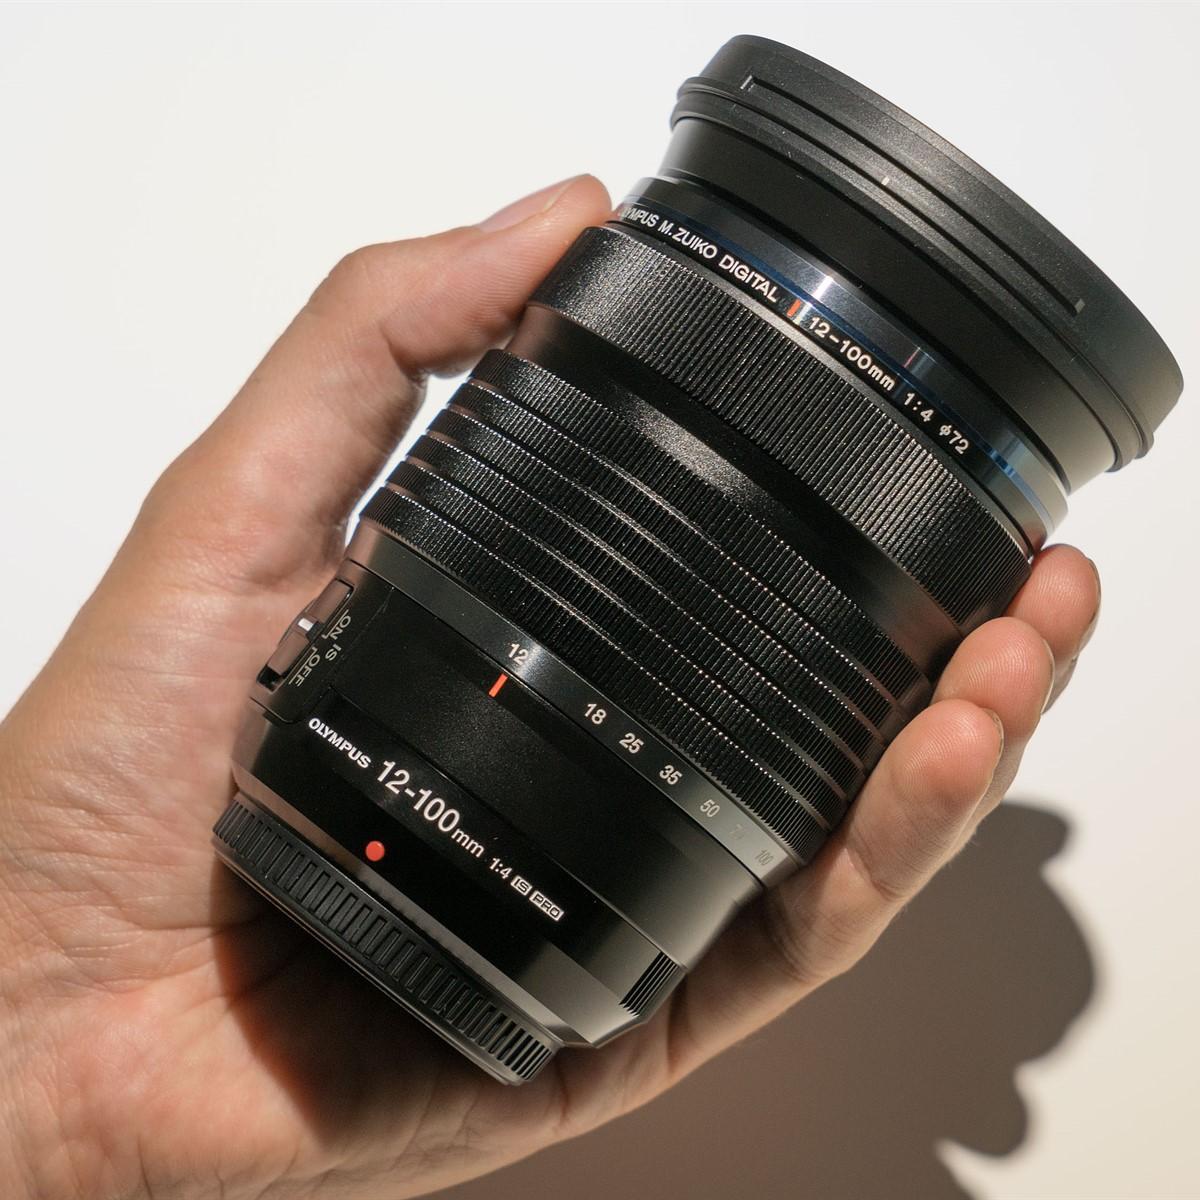 Photokina 2016 Meet The New Olympus 12 100mm F40 Is Pro Digital Mzuiko Ed 300mm F 4 Lens Photography Review